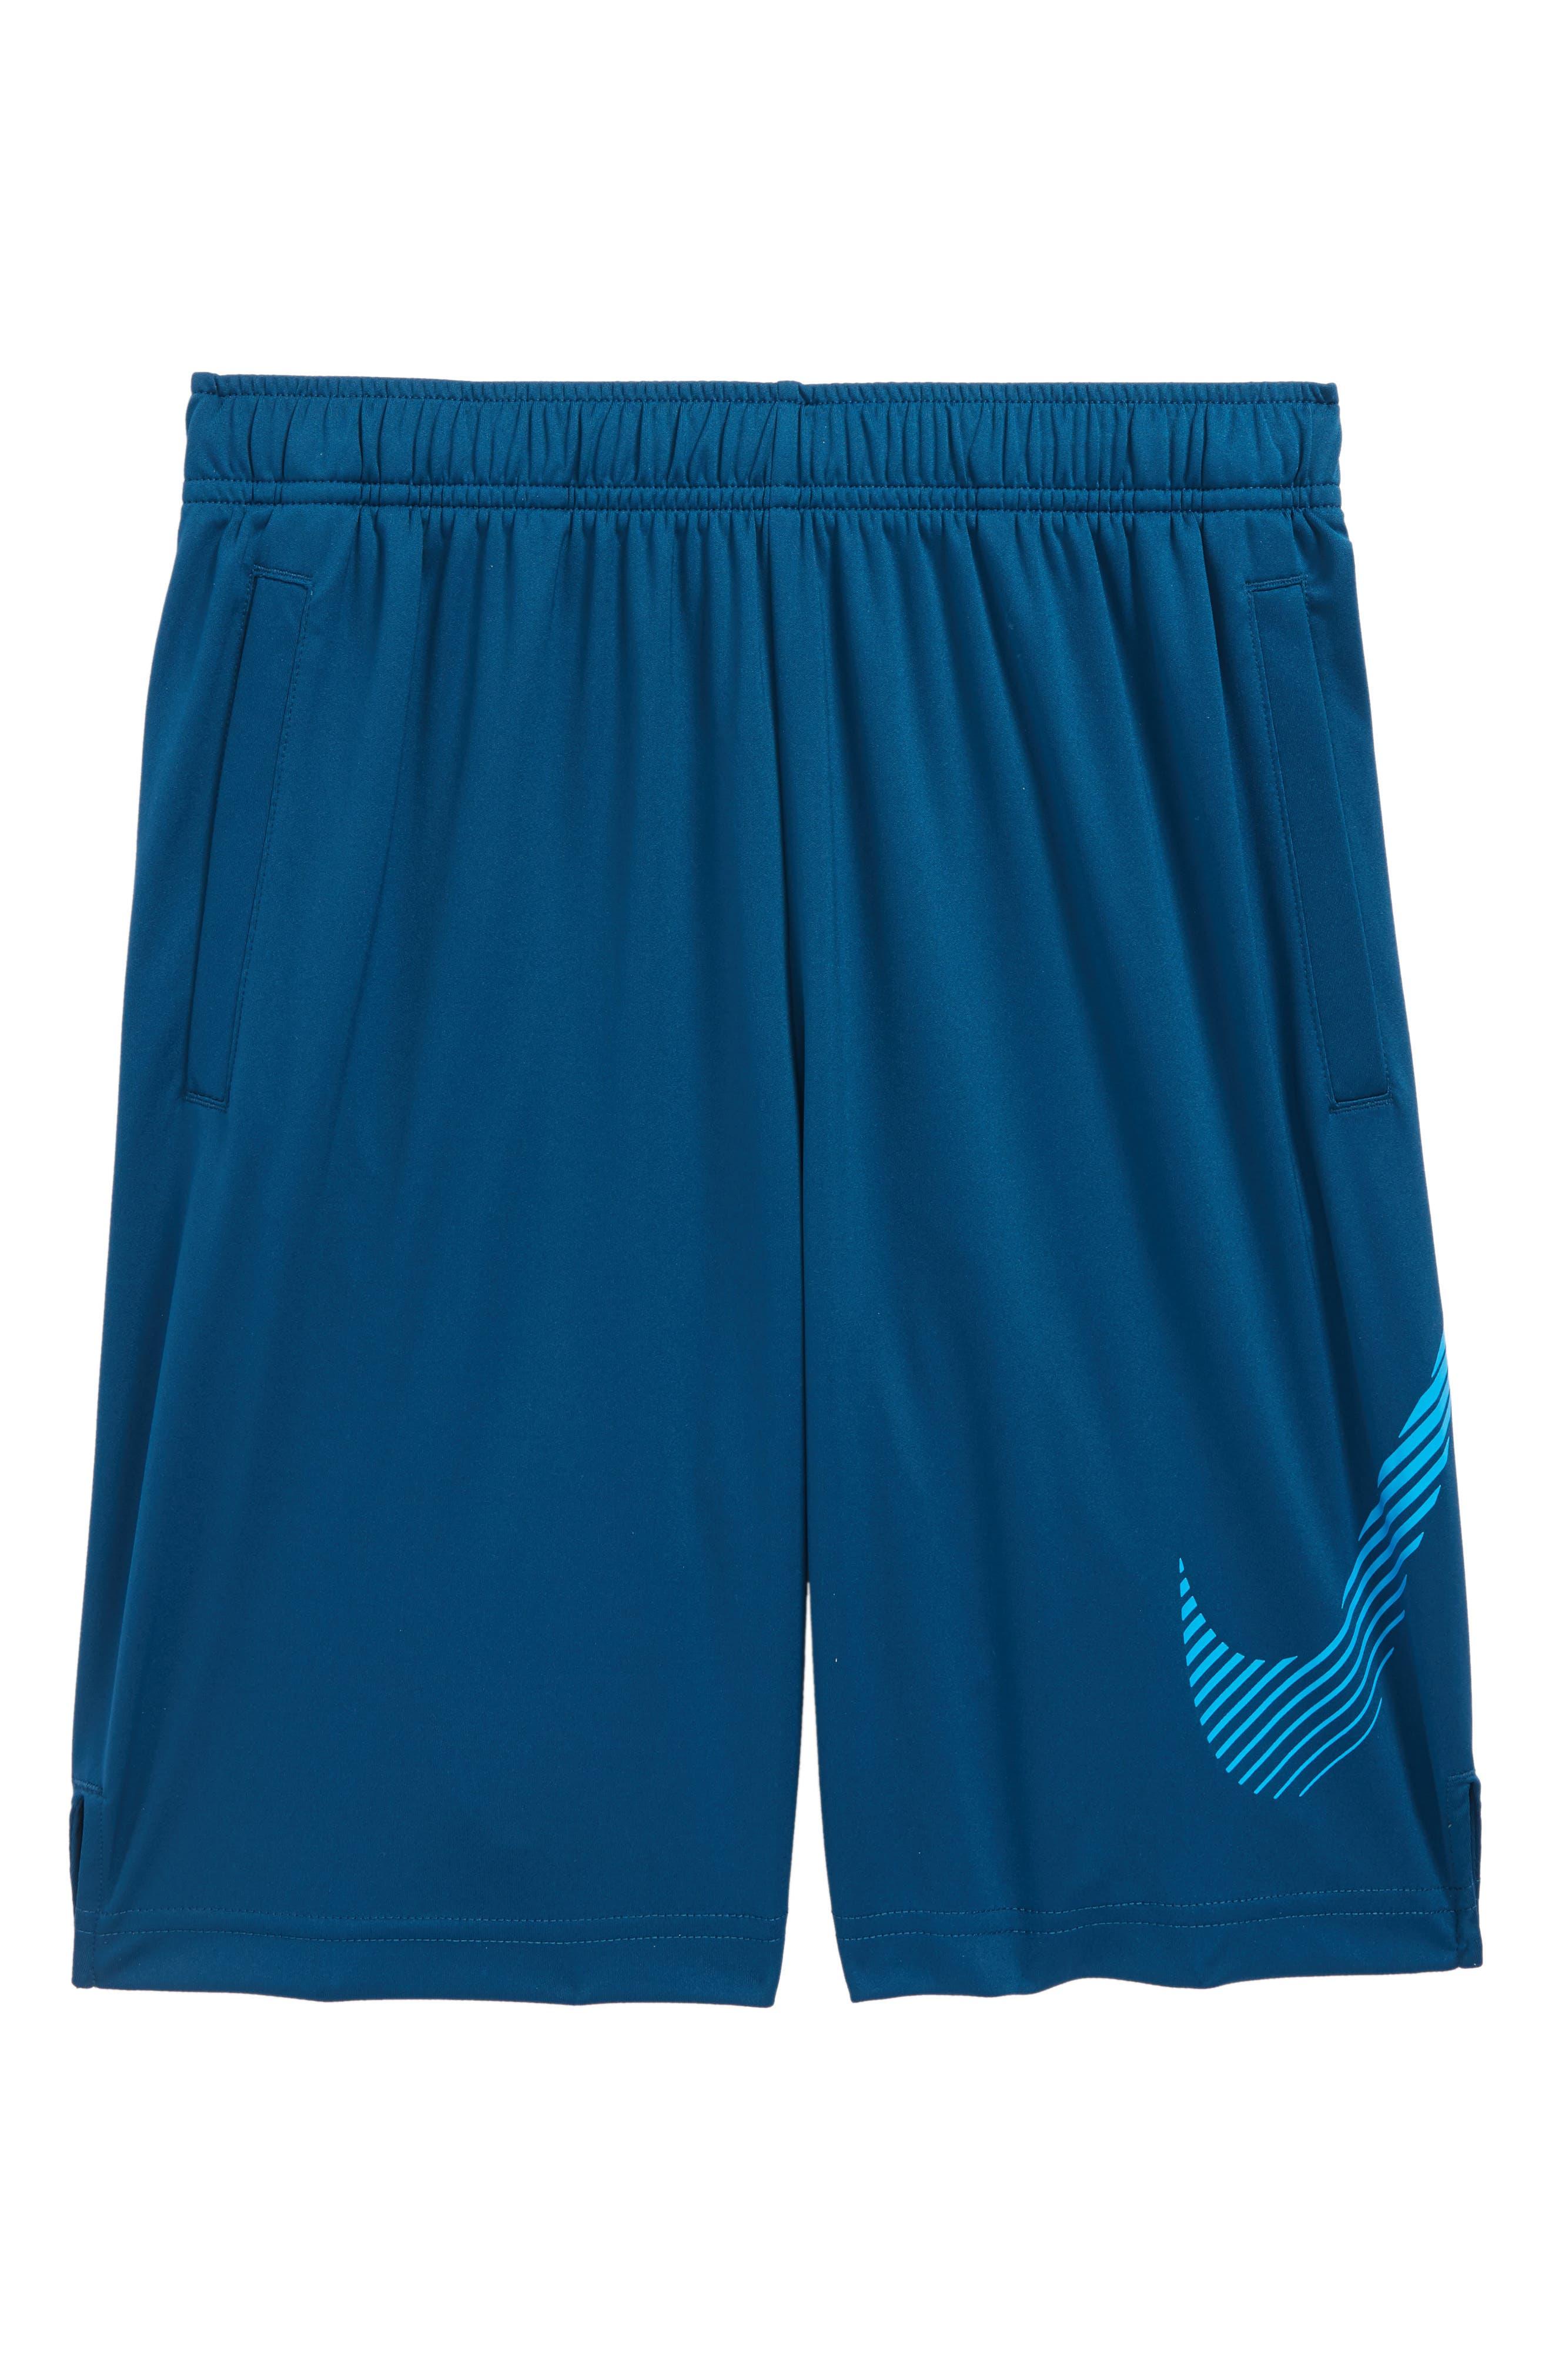 Dry Training Shorts,                             Main thumbnail 1, color,                             Blue Force/ Equator Blue